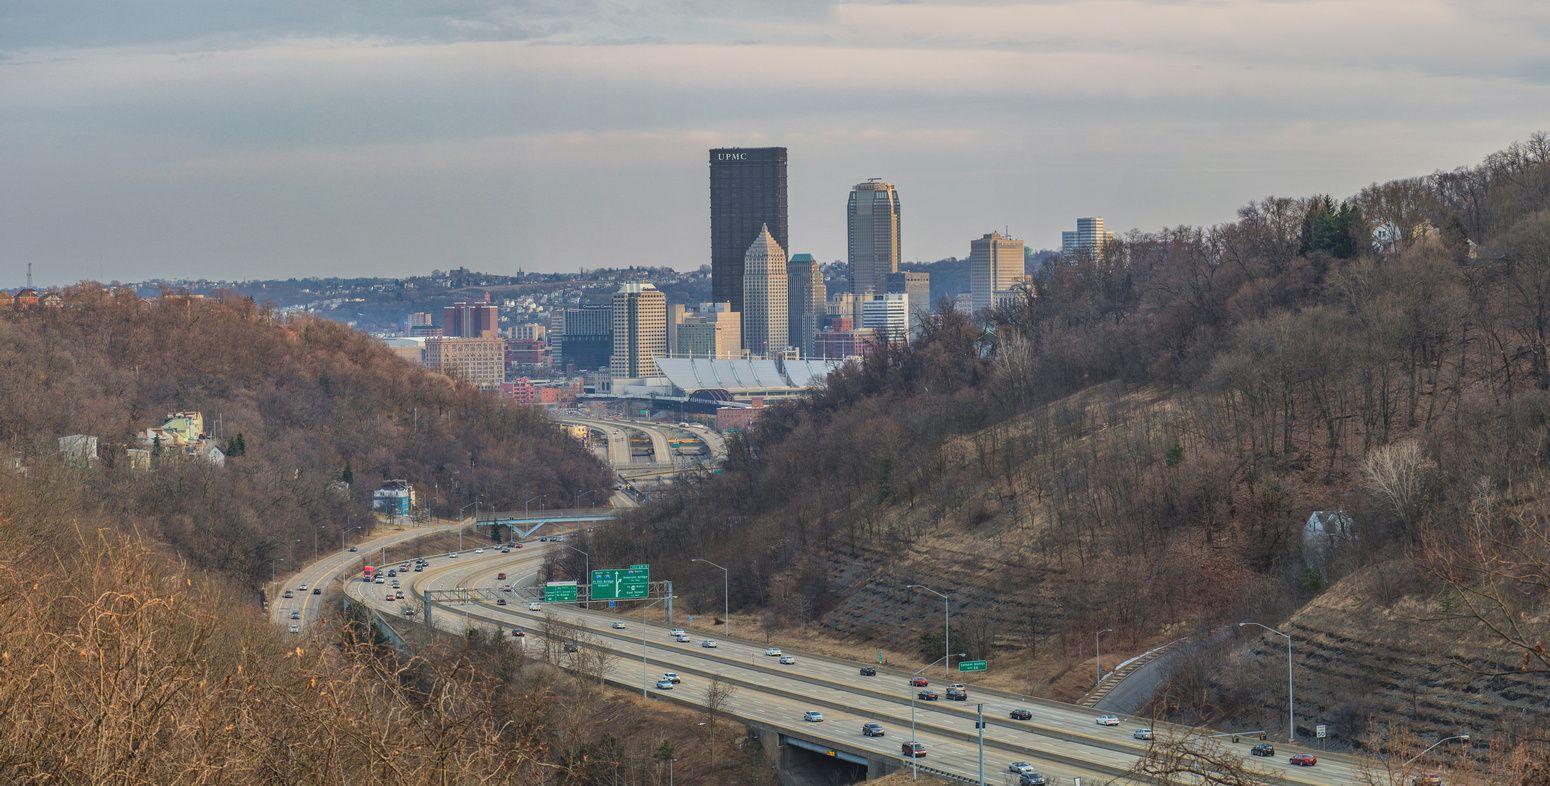 Panoramas Pittsburgh Panorama From Above 279 At Dusk Panorama Scenery Monongahela